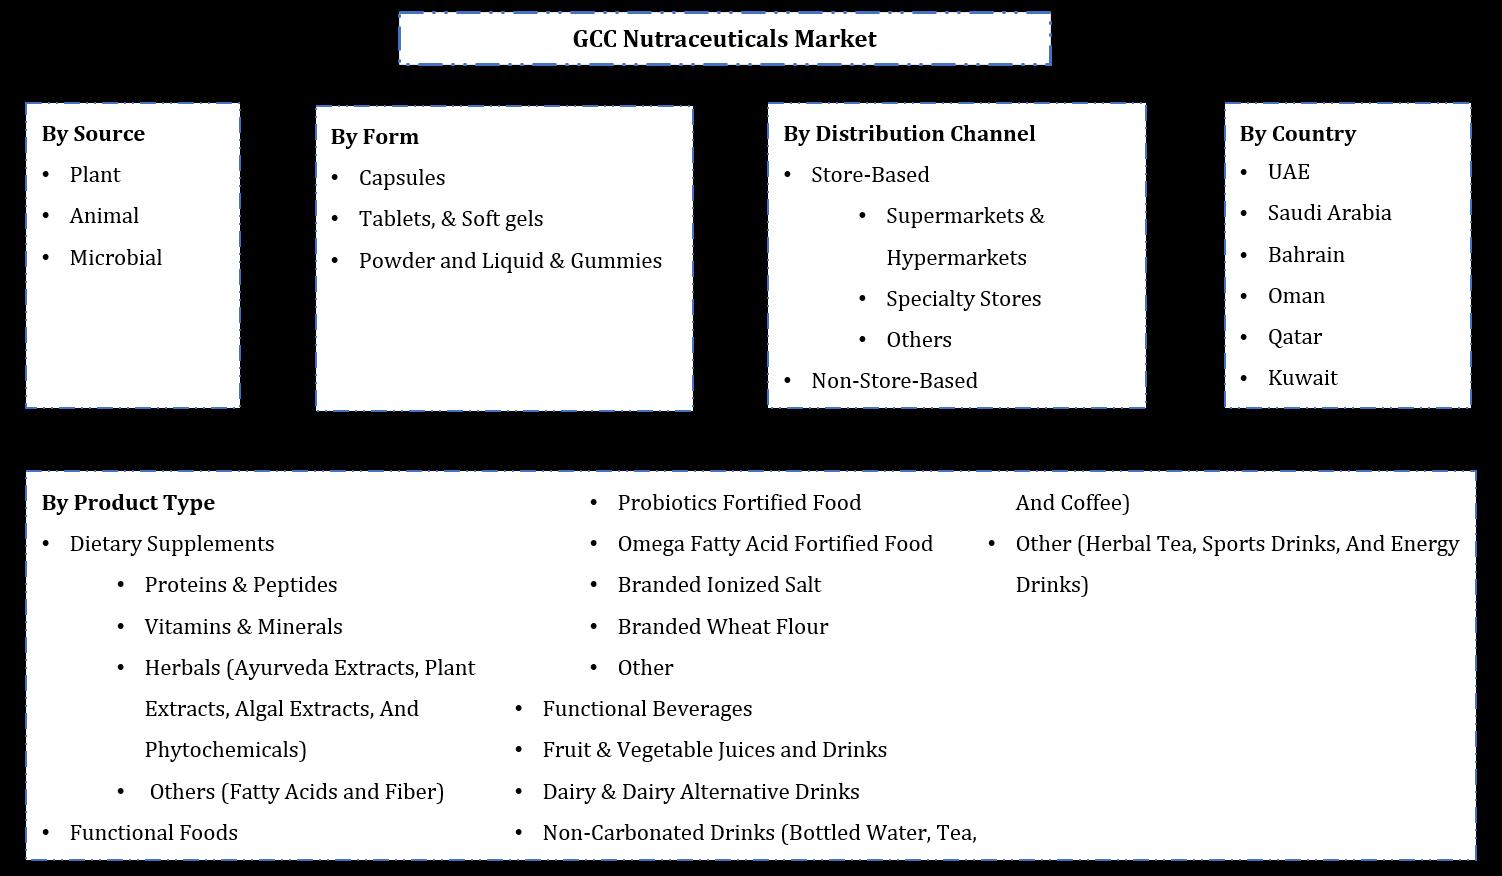 GCC Nutraceuticals Market Segmentation